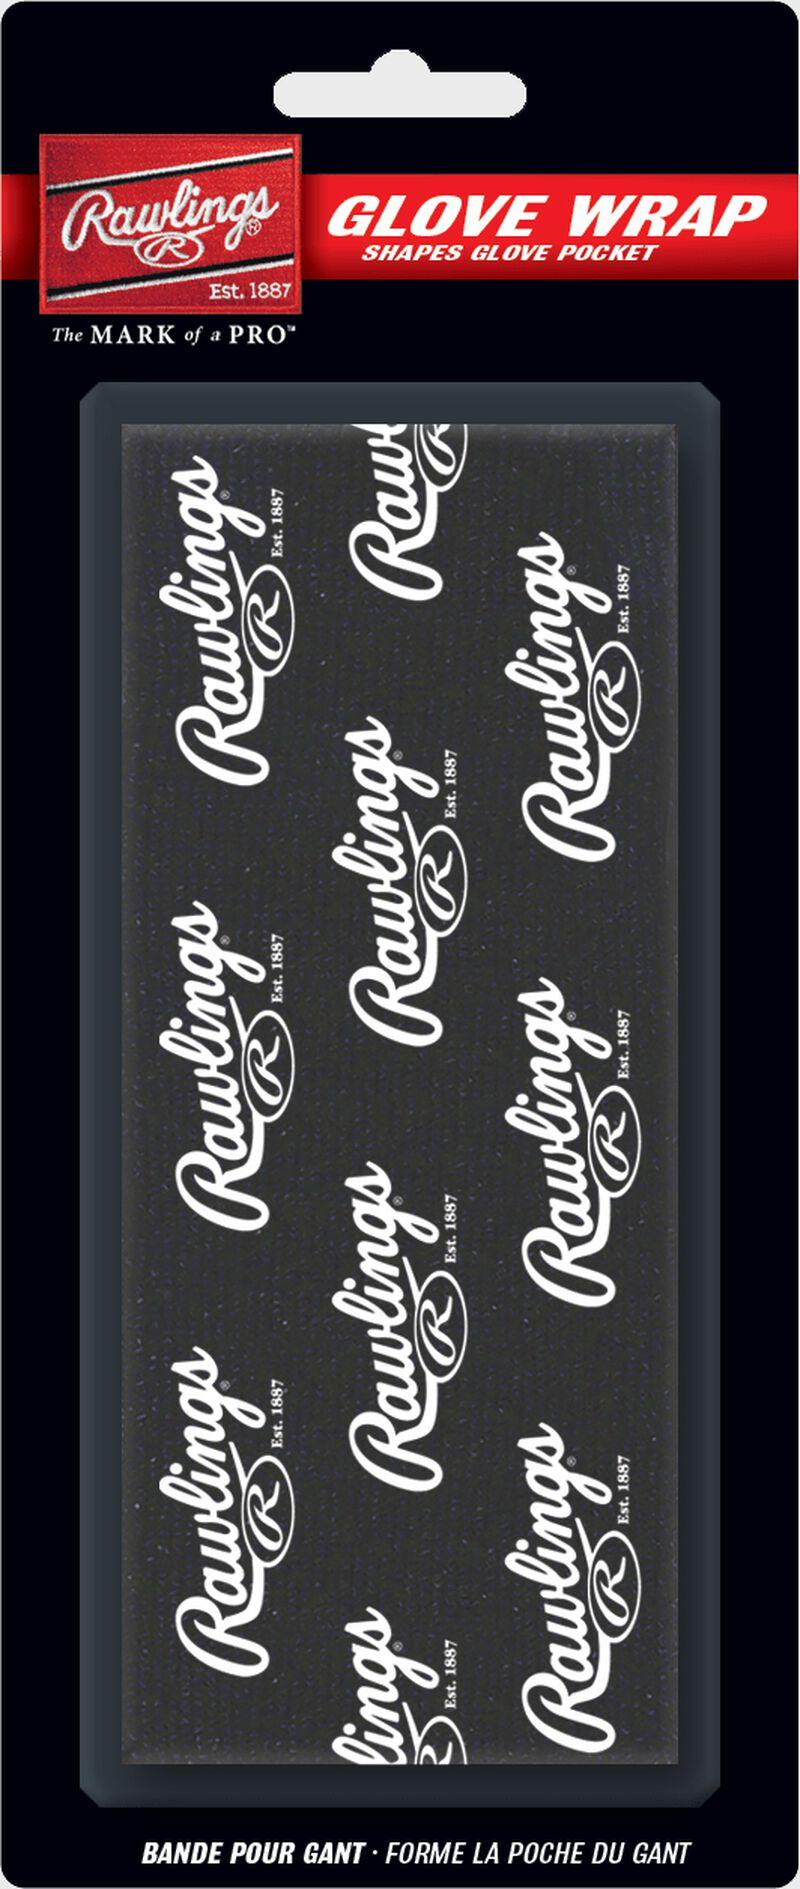 Rawlings Black Glove Wrap With Brand Name SKU #GW